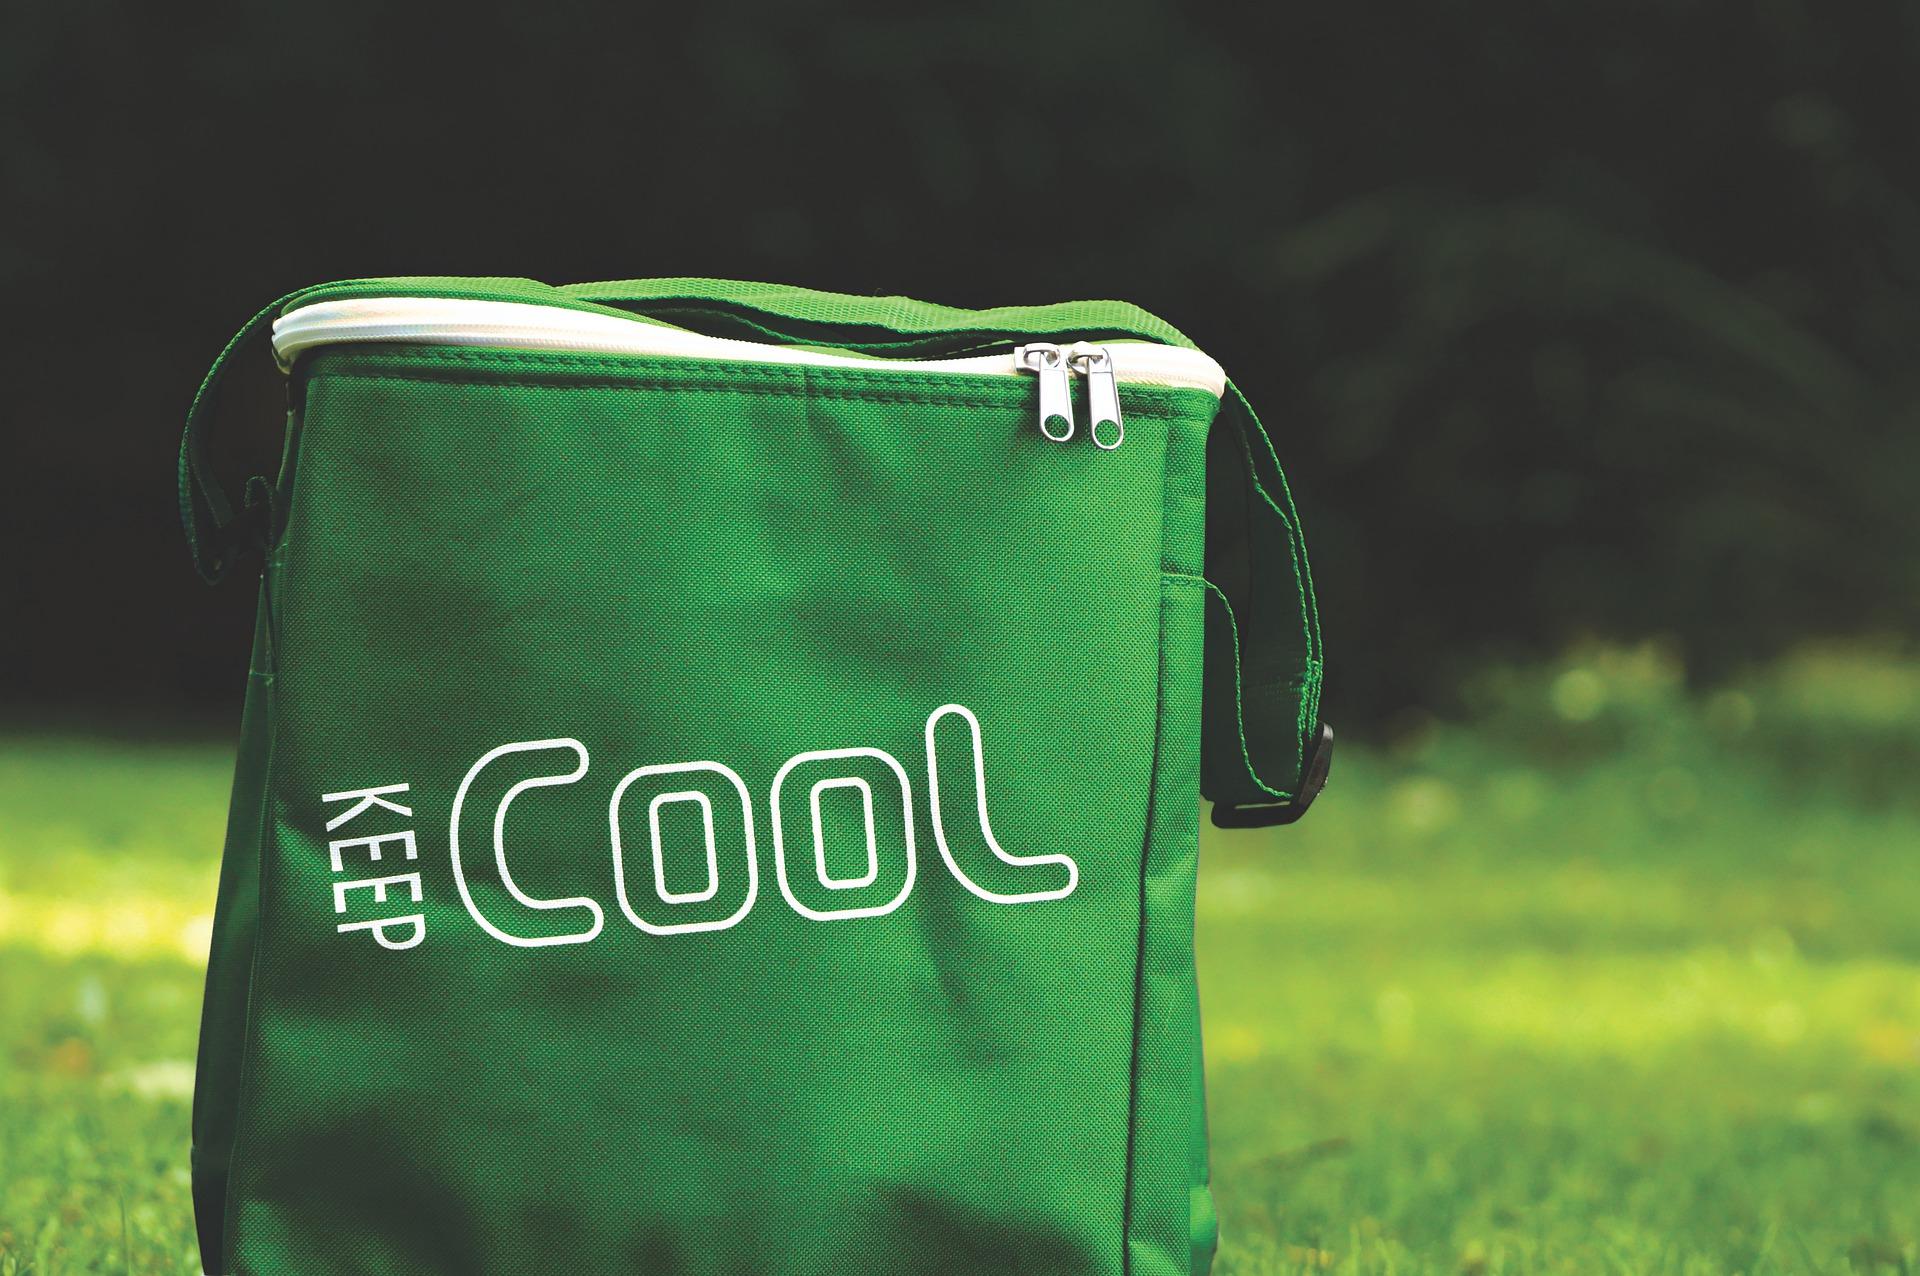 cooler-bag-4812757_1920.jpg